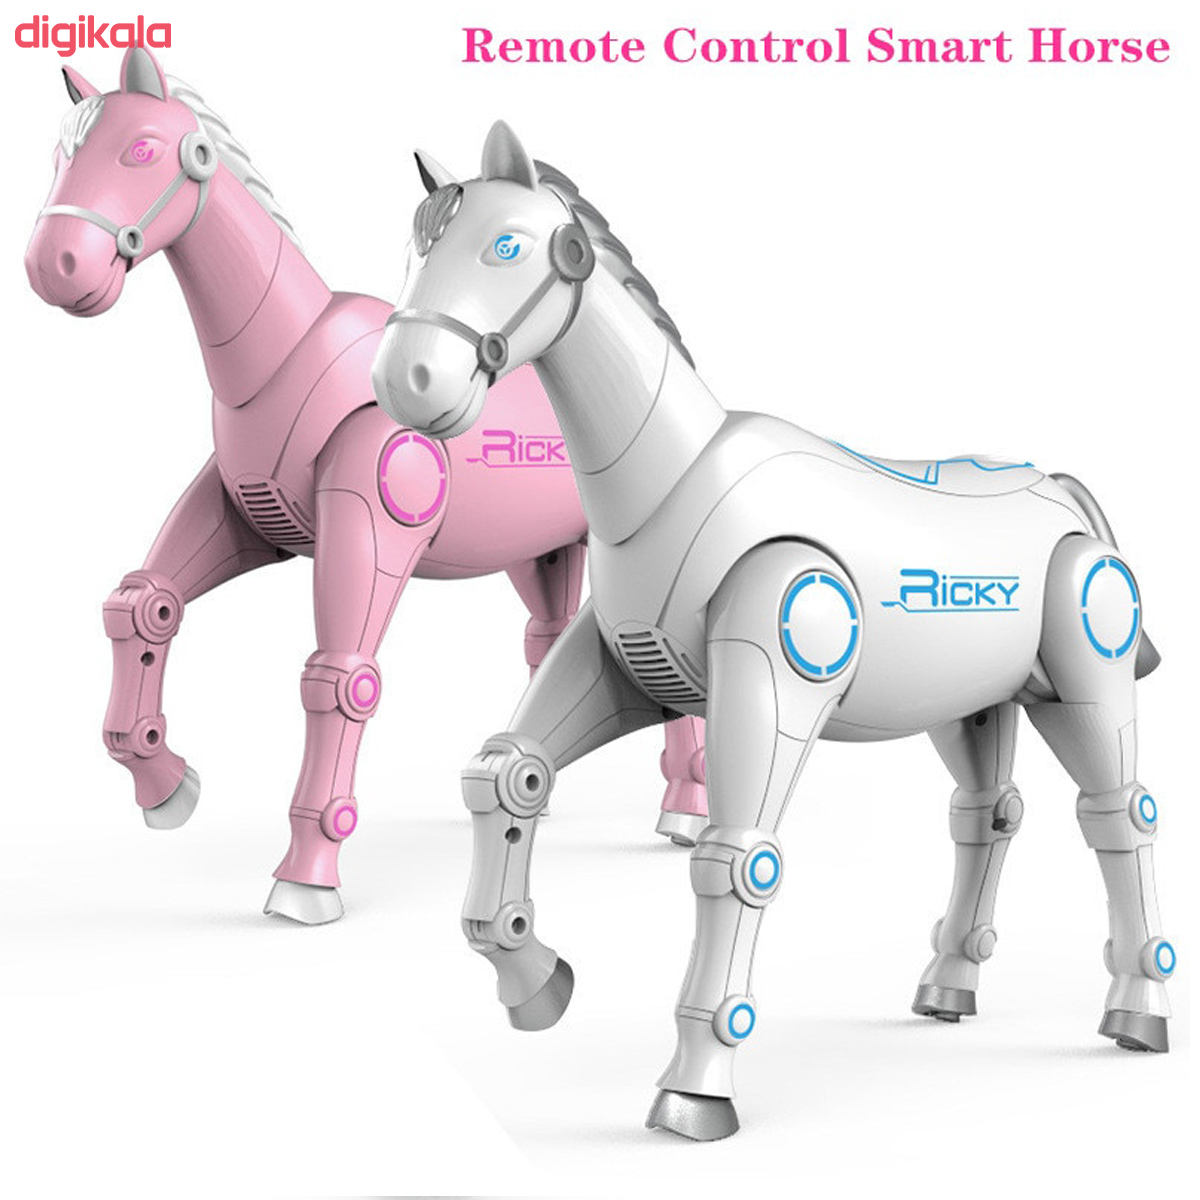 اسباب بازی طرح ربات مدل اسب هوشمند کد  A164966 main 1 2